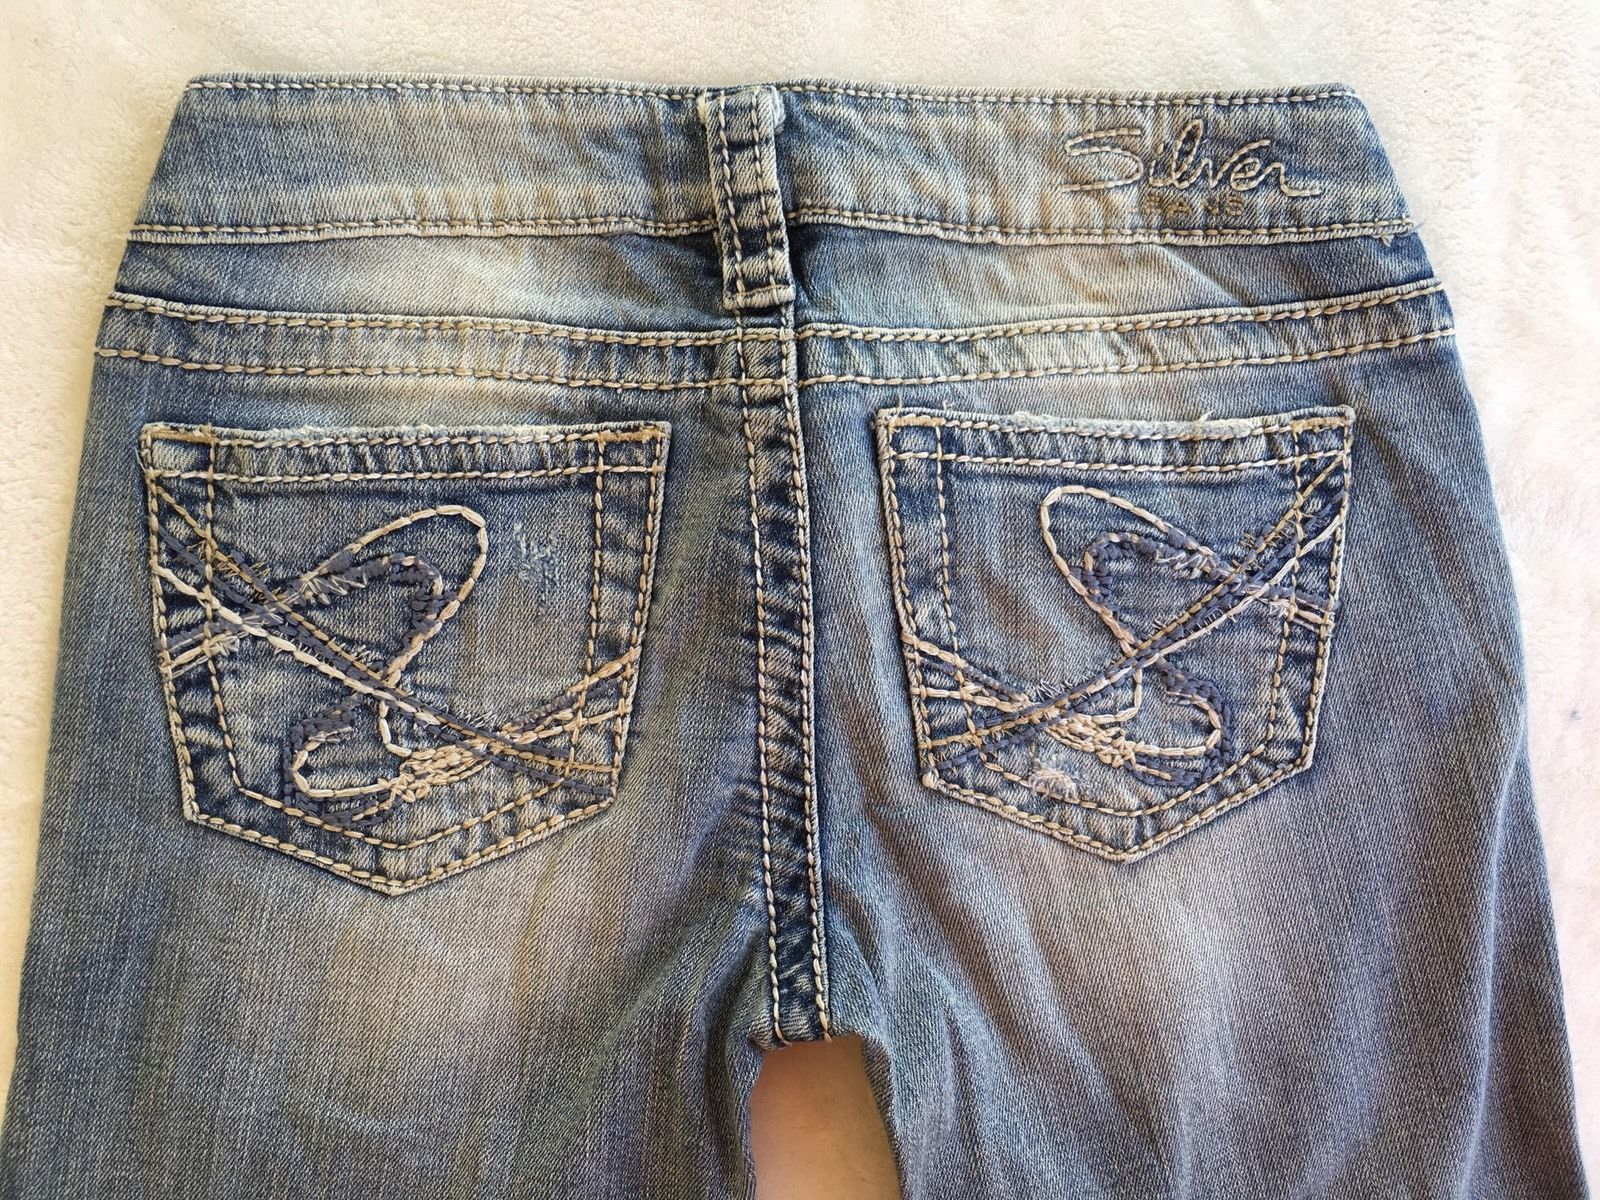 SILVER Jeans Sale Buckle Low Rise Tuesday Denim Jean Stretch Bermuda Shorts 25